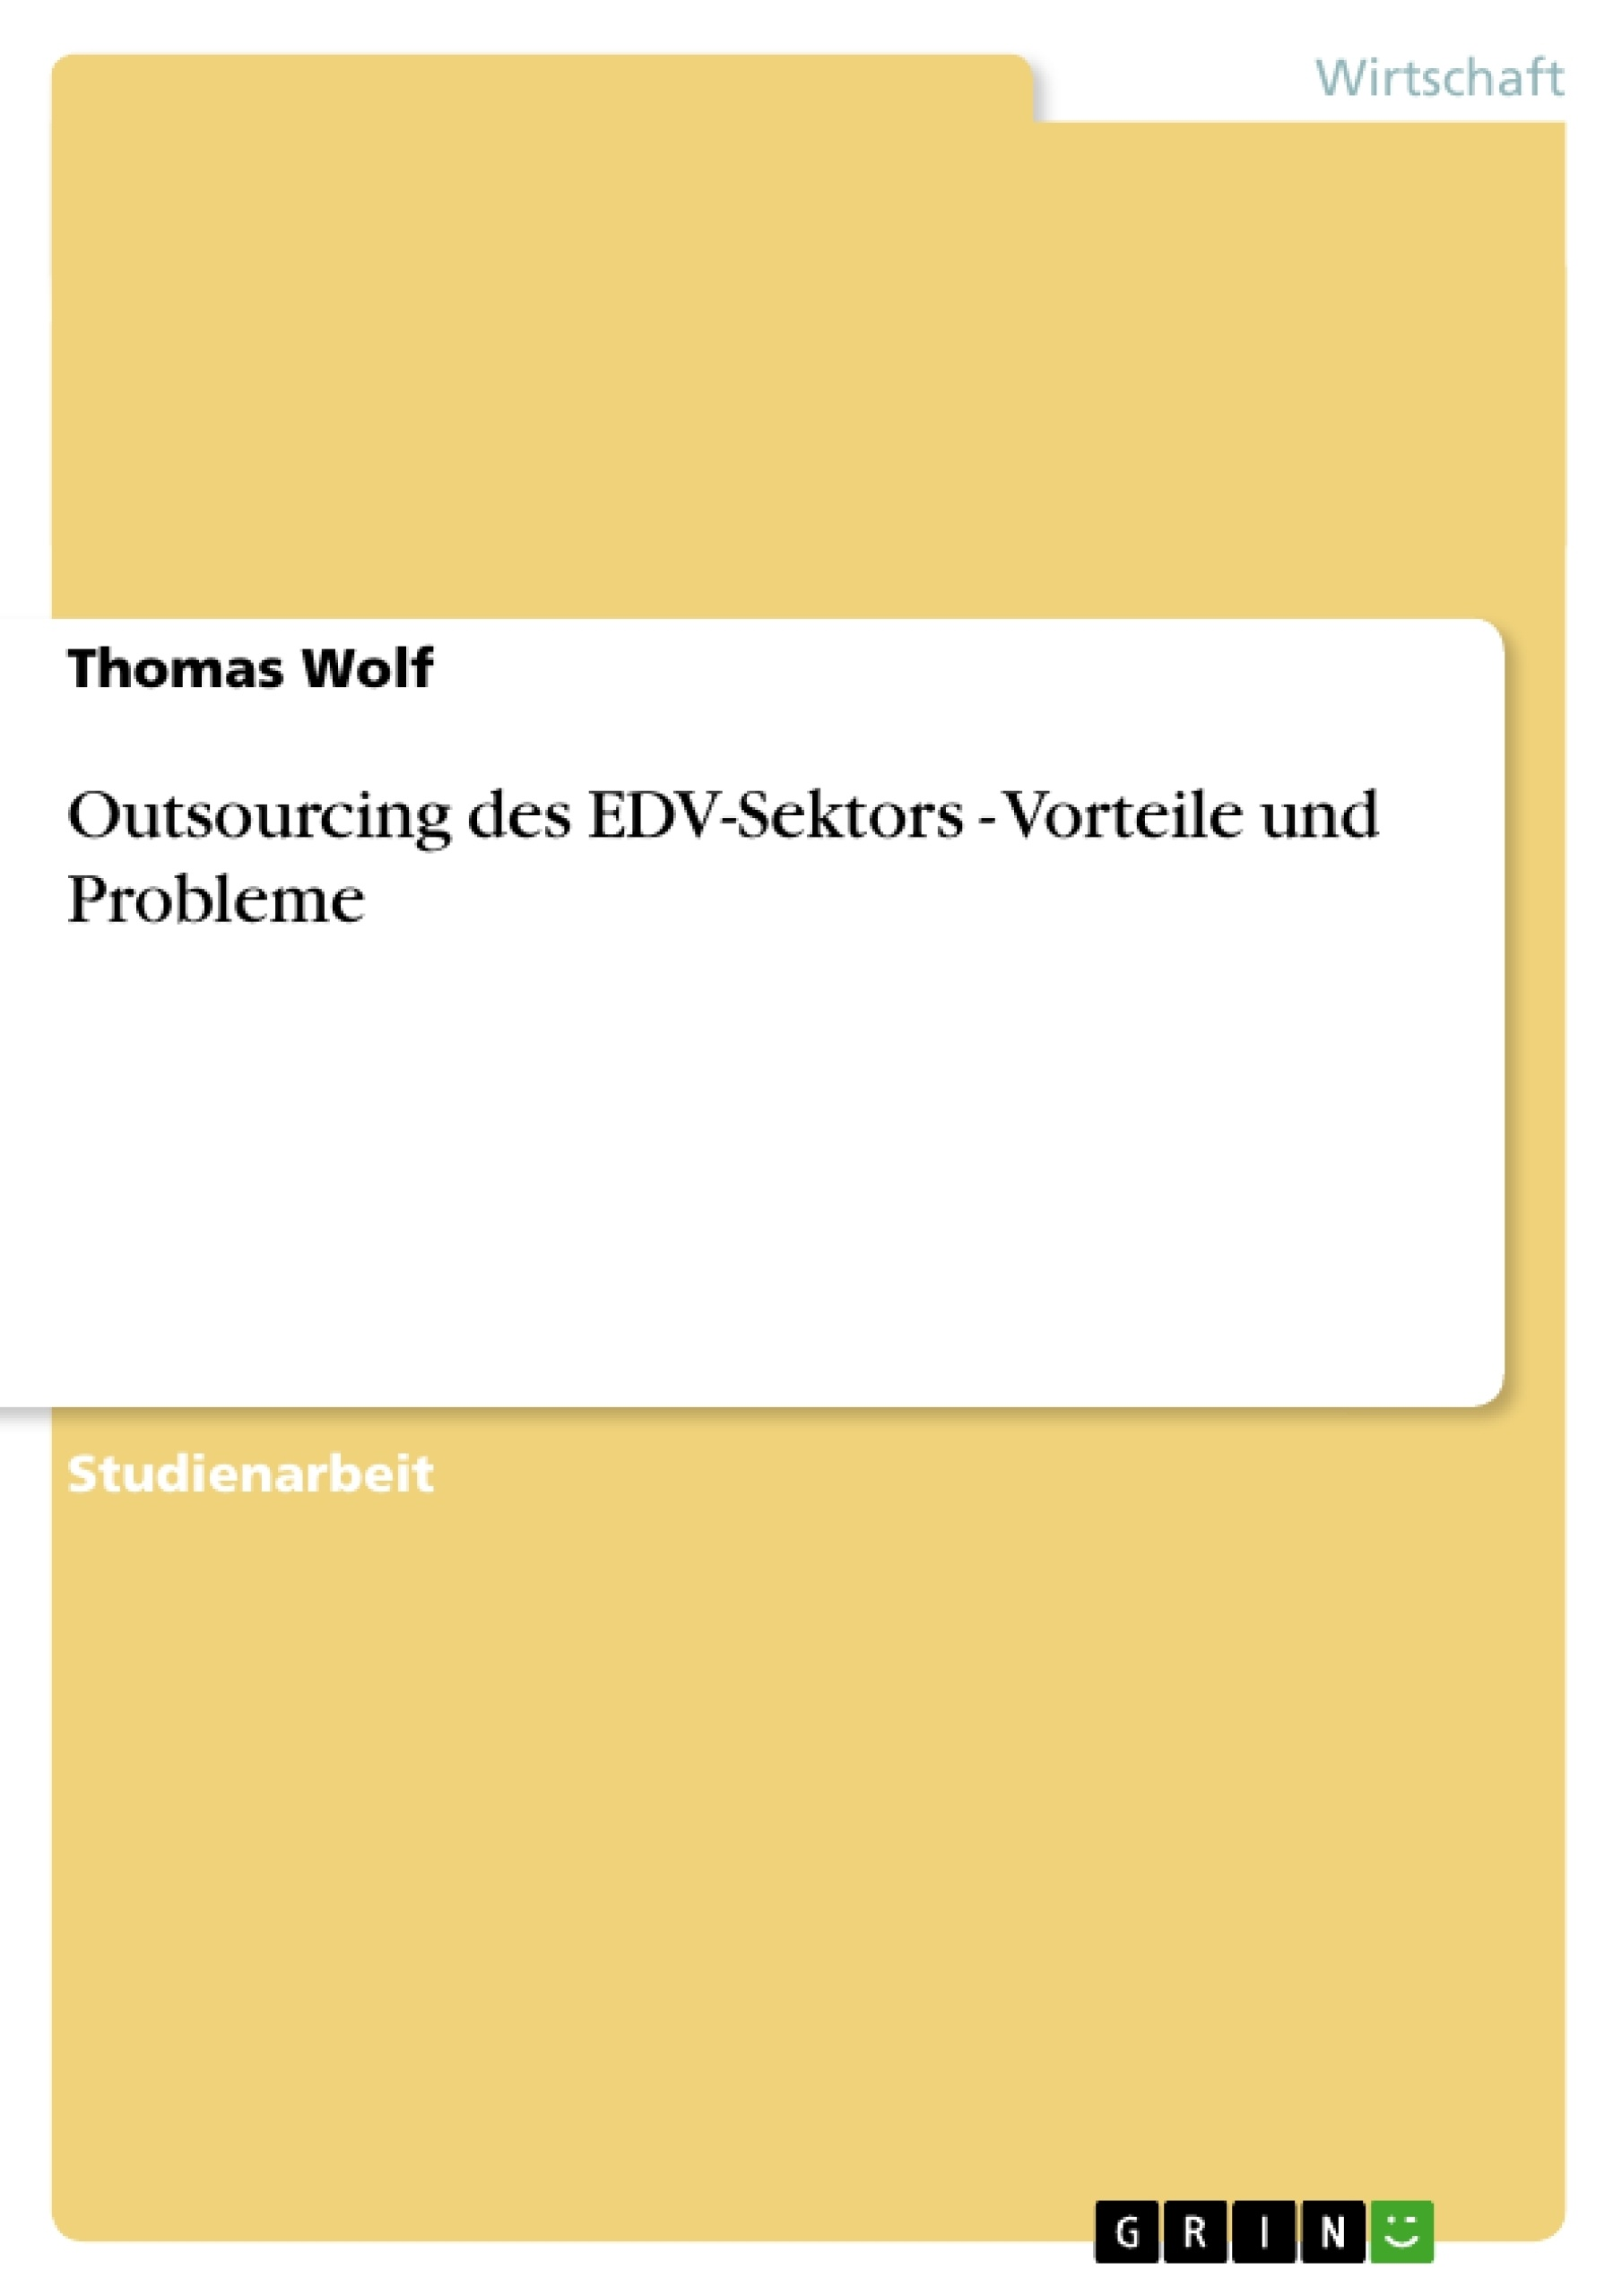 Titel: Outsourcing des EDV-Sektors - Vorteile und Probleme